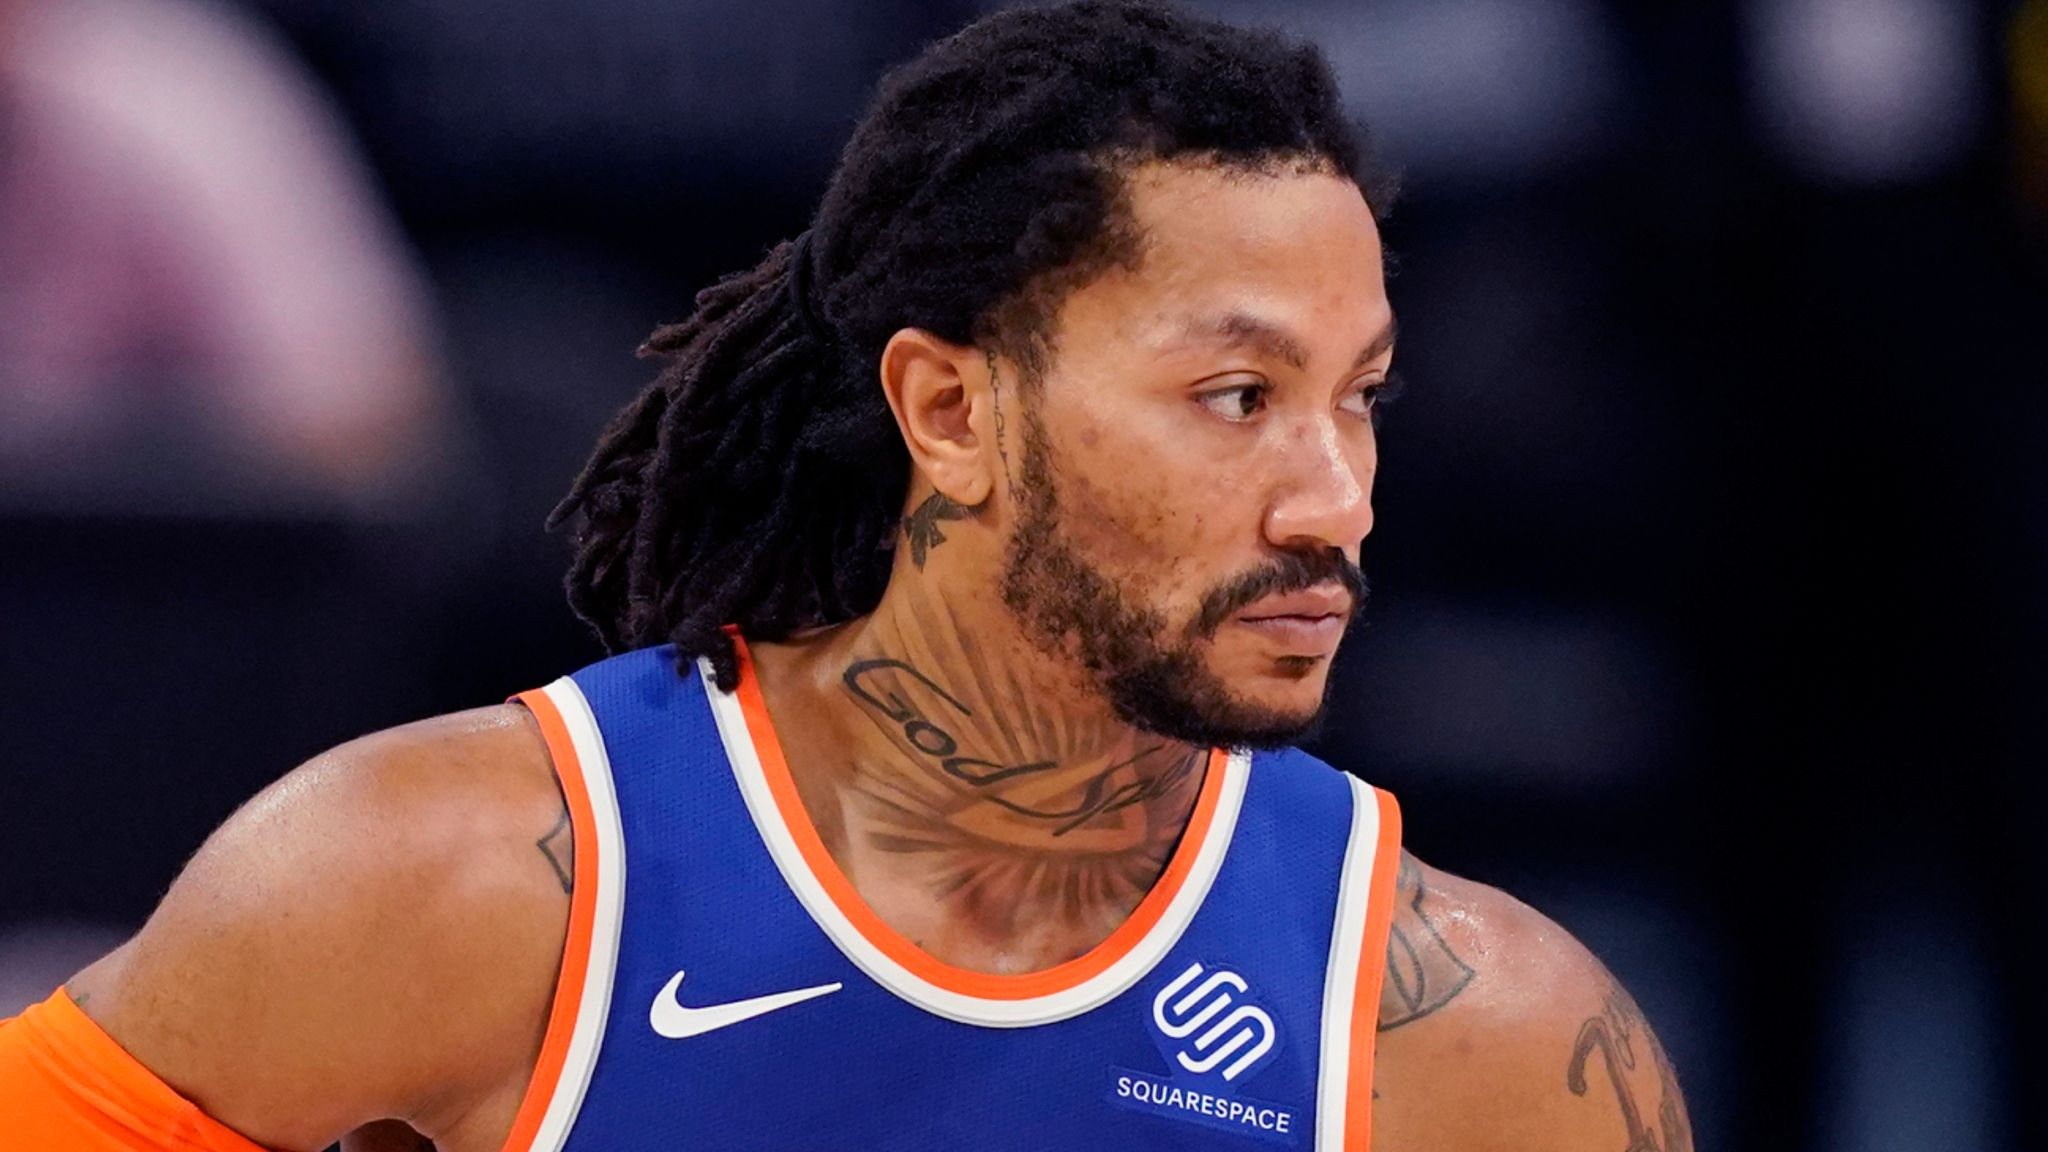 Derrick Rose New York Knicks Guard Reveals Details Of Coronavirus Illness Nba News Sky Sports